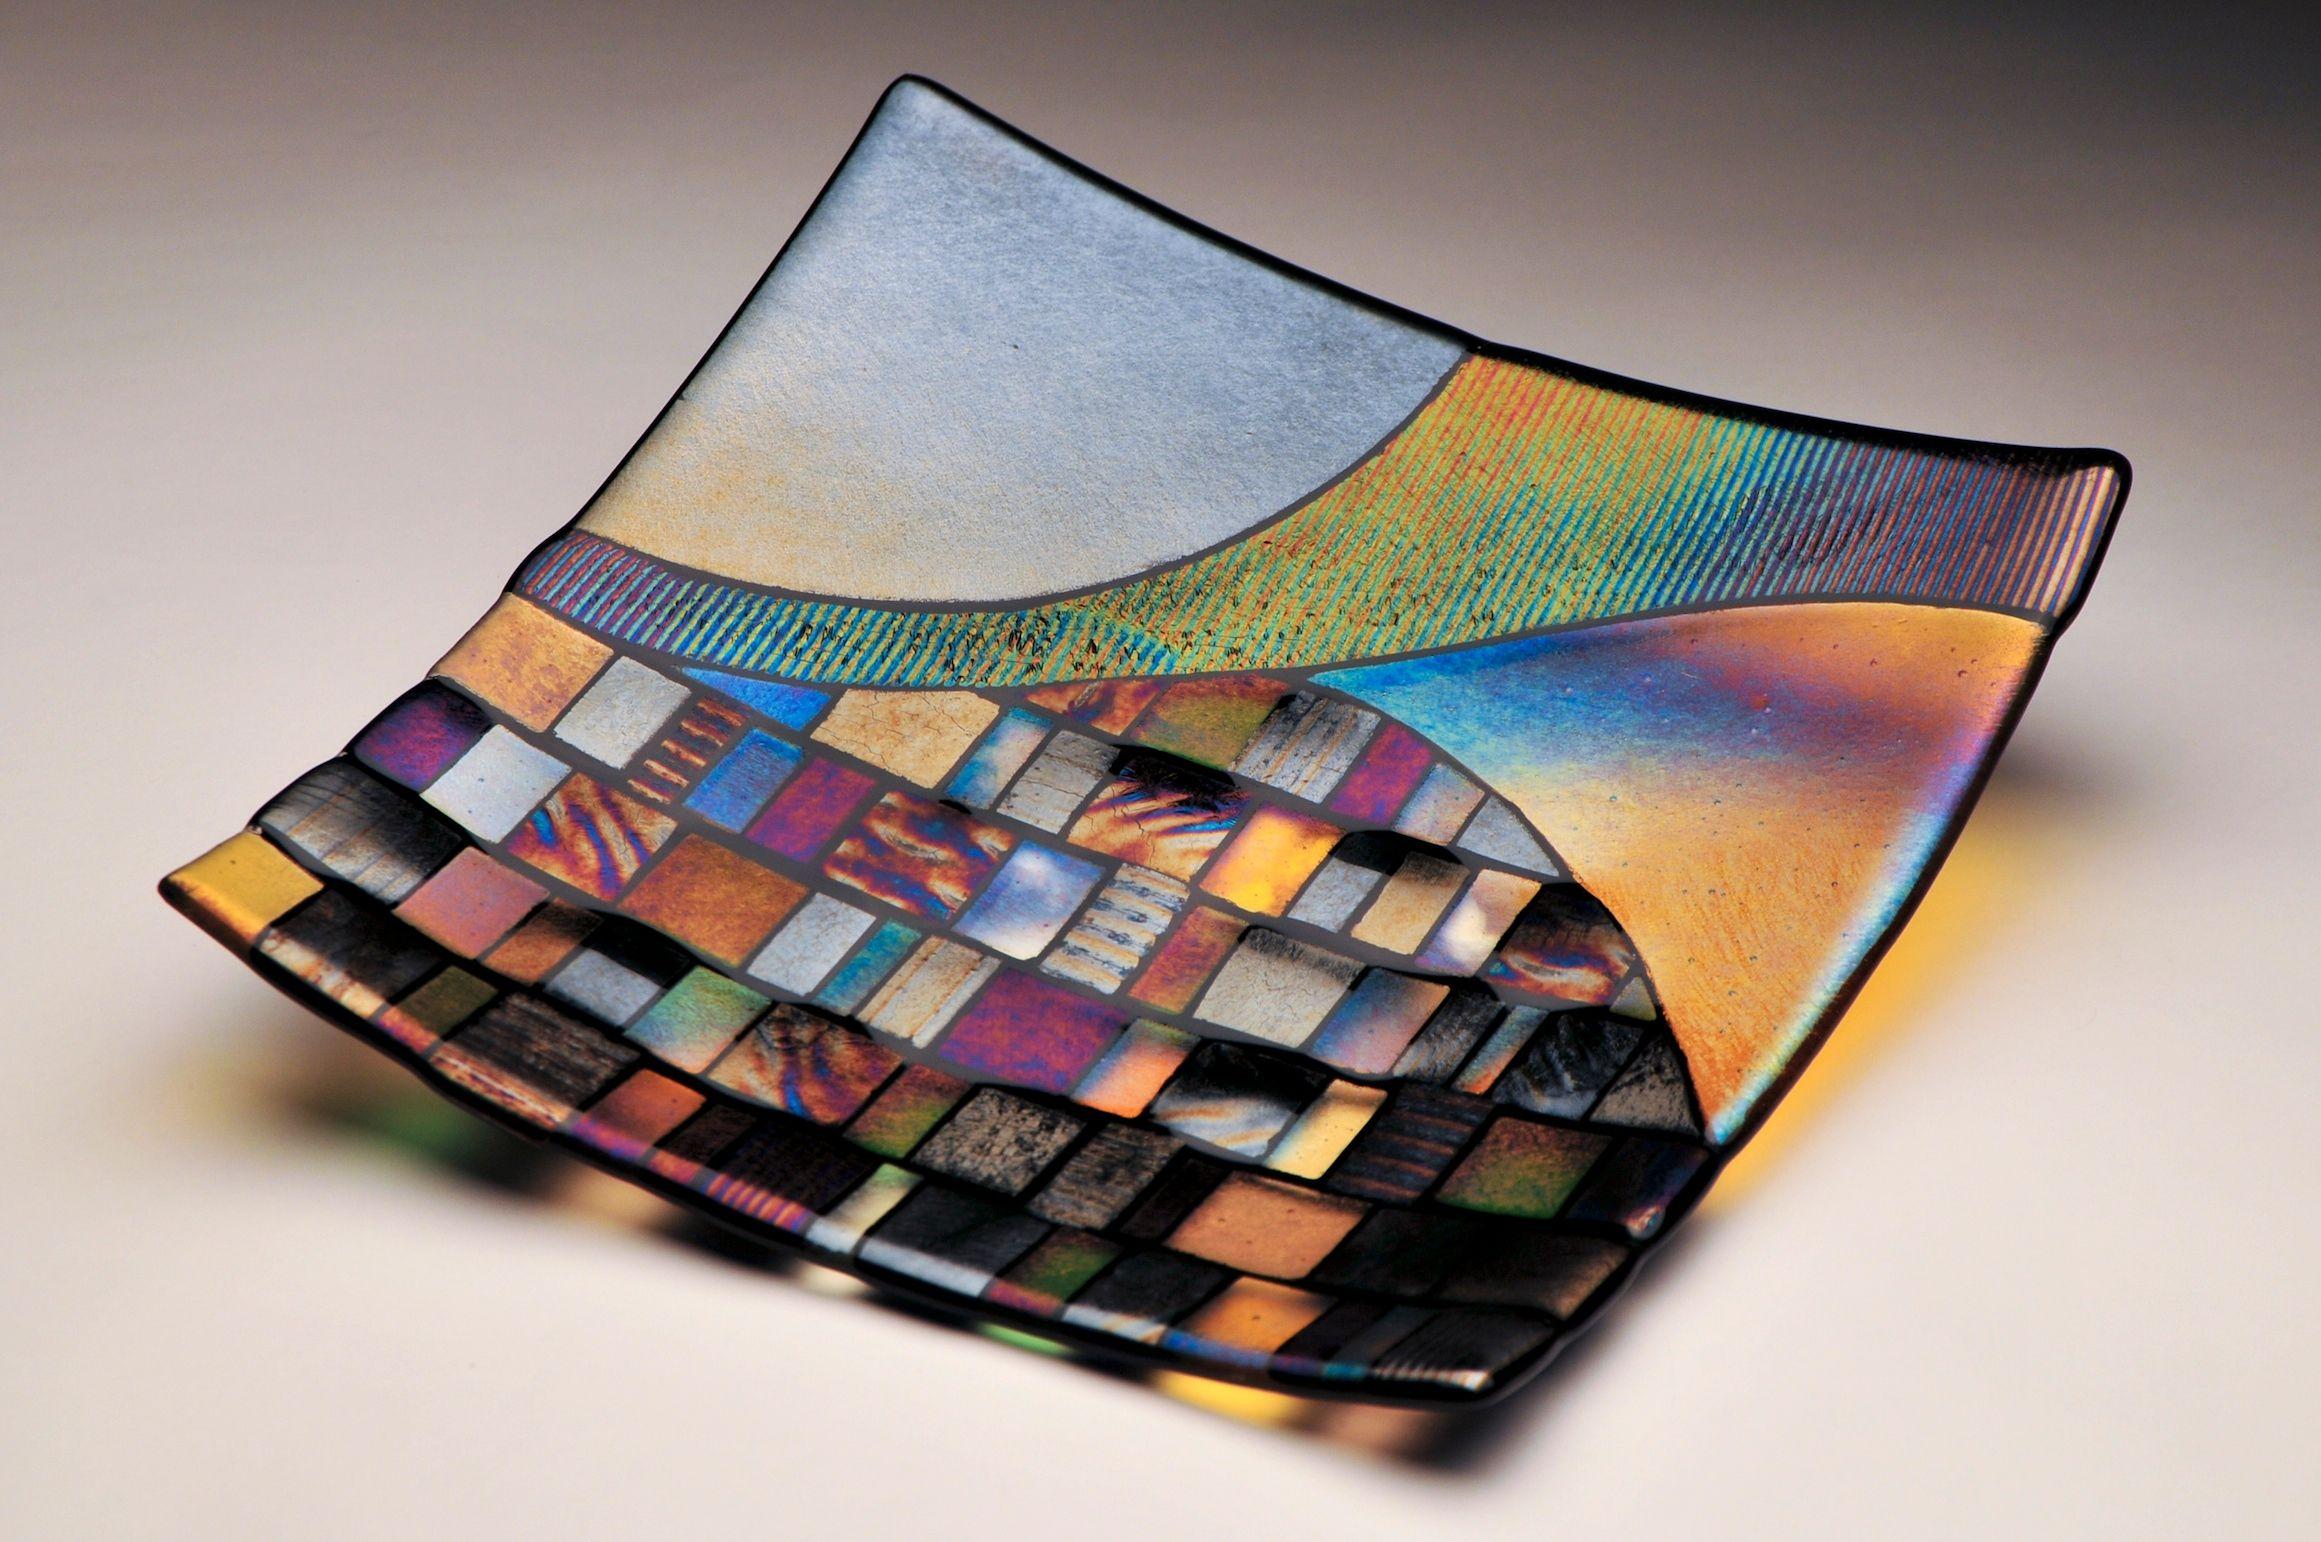 Fused glass plate by Prairie Glass Art Studio